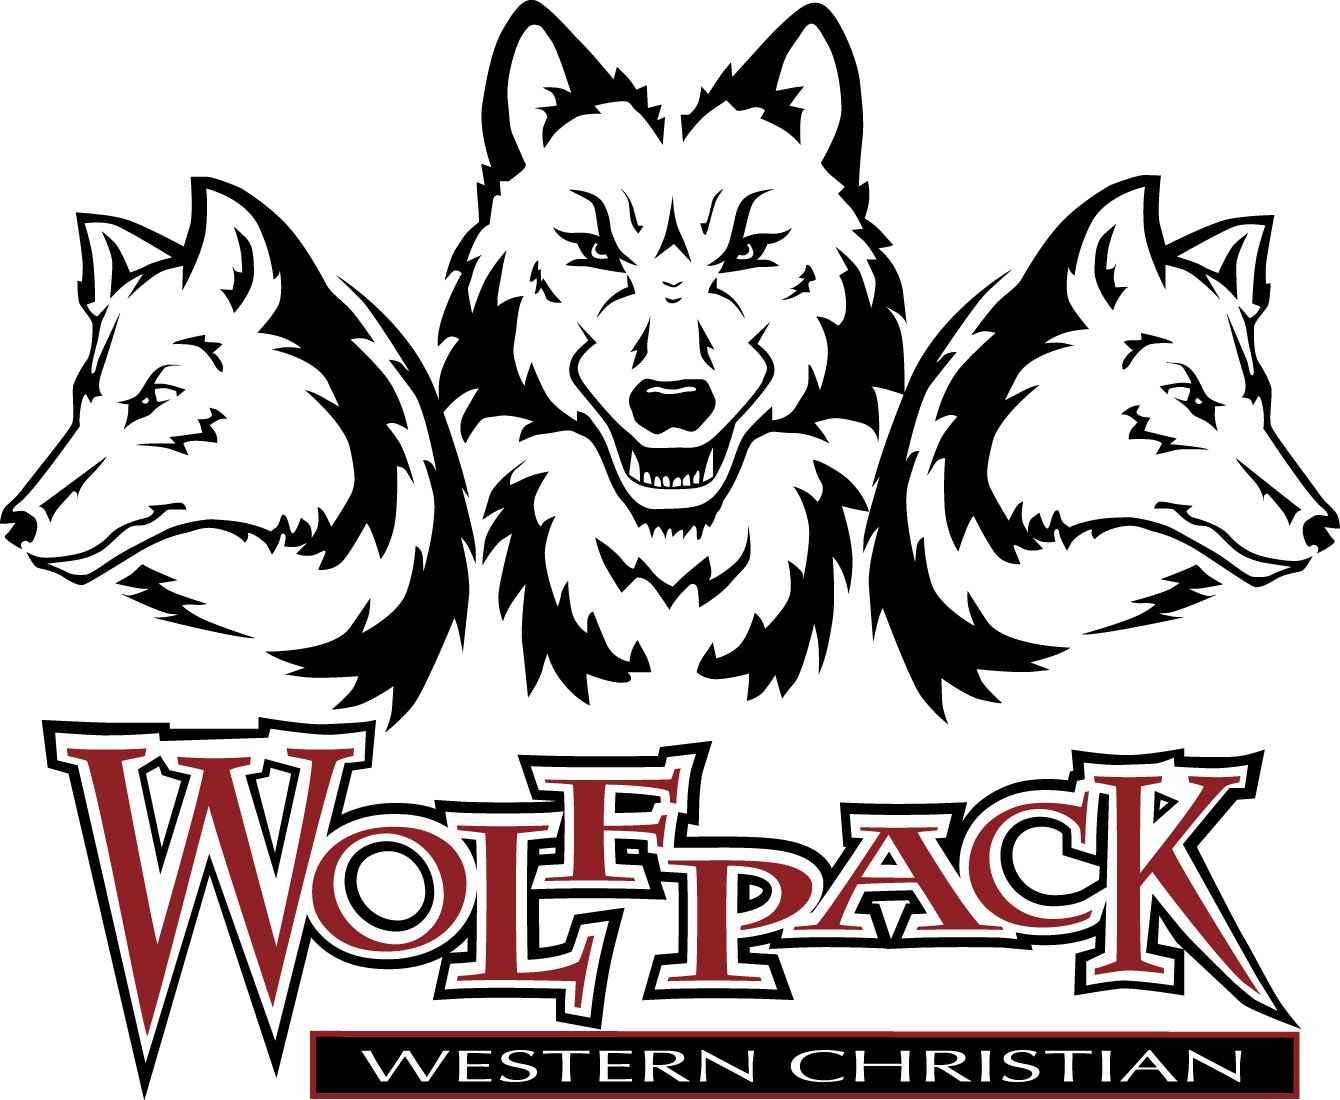 Wolf pack logo design - photo#45